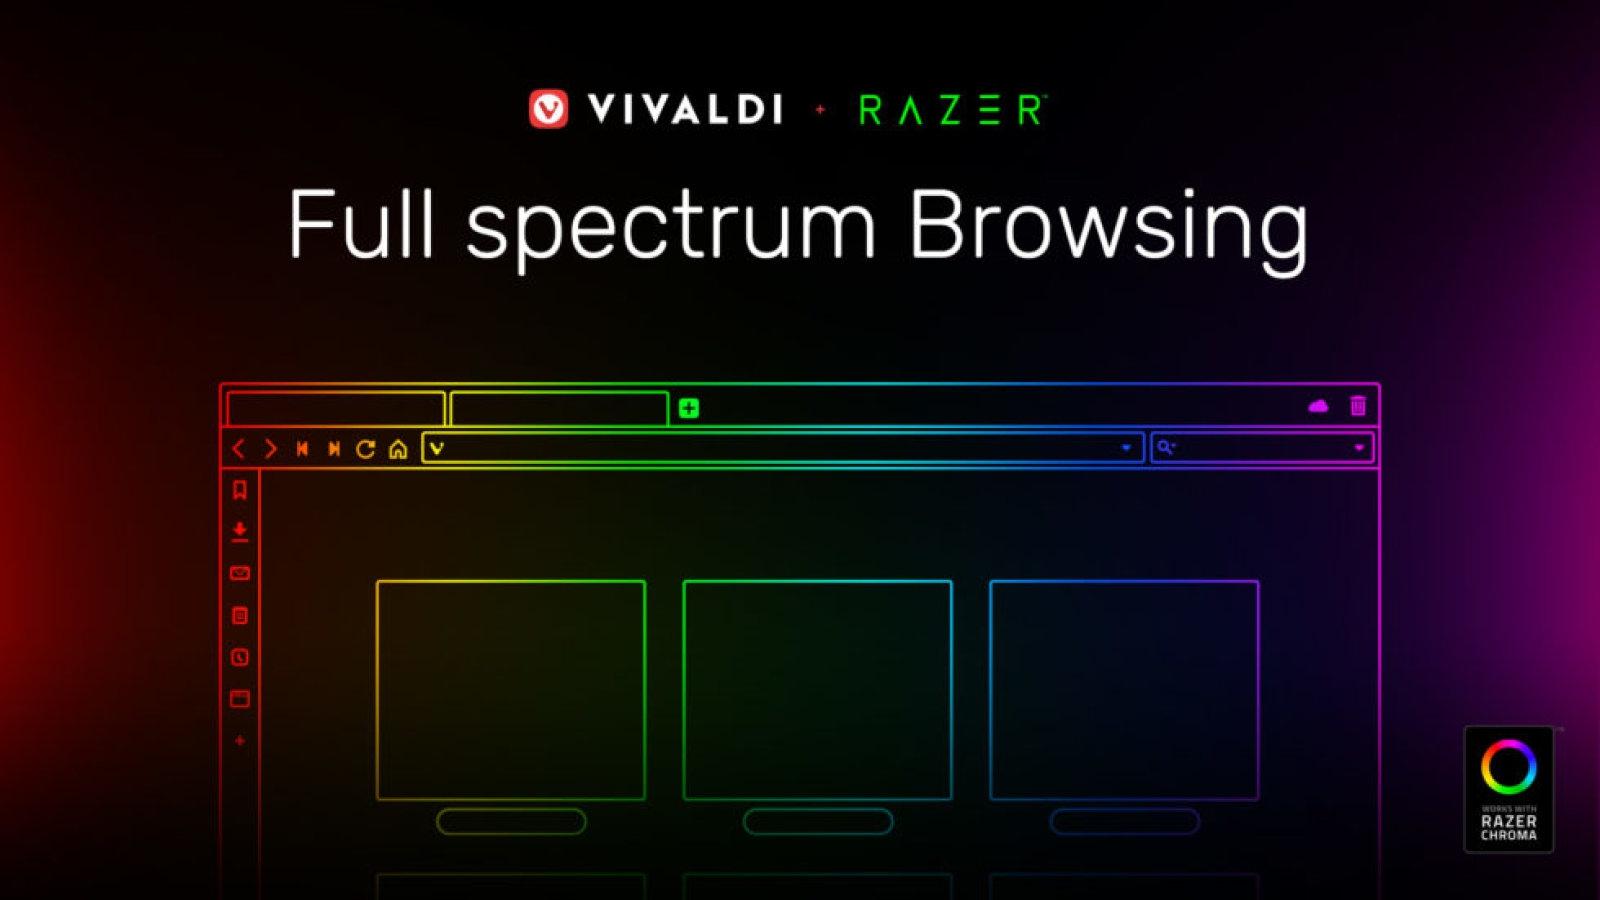 Vivaldi browser syncs Razer Chroma lights with website colors   DeviceDaily.com